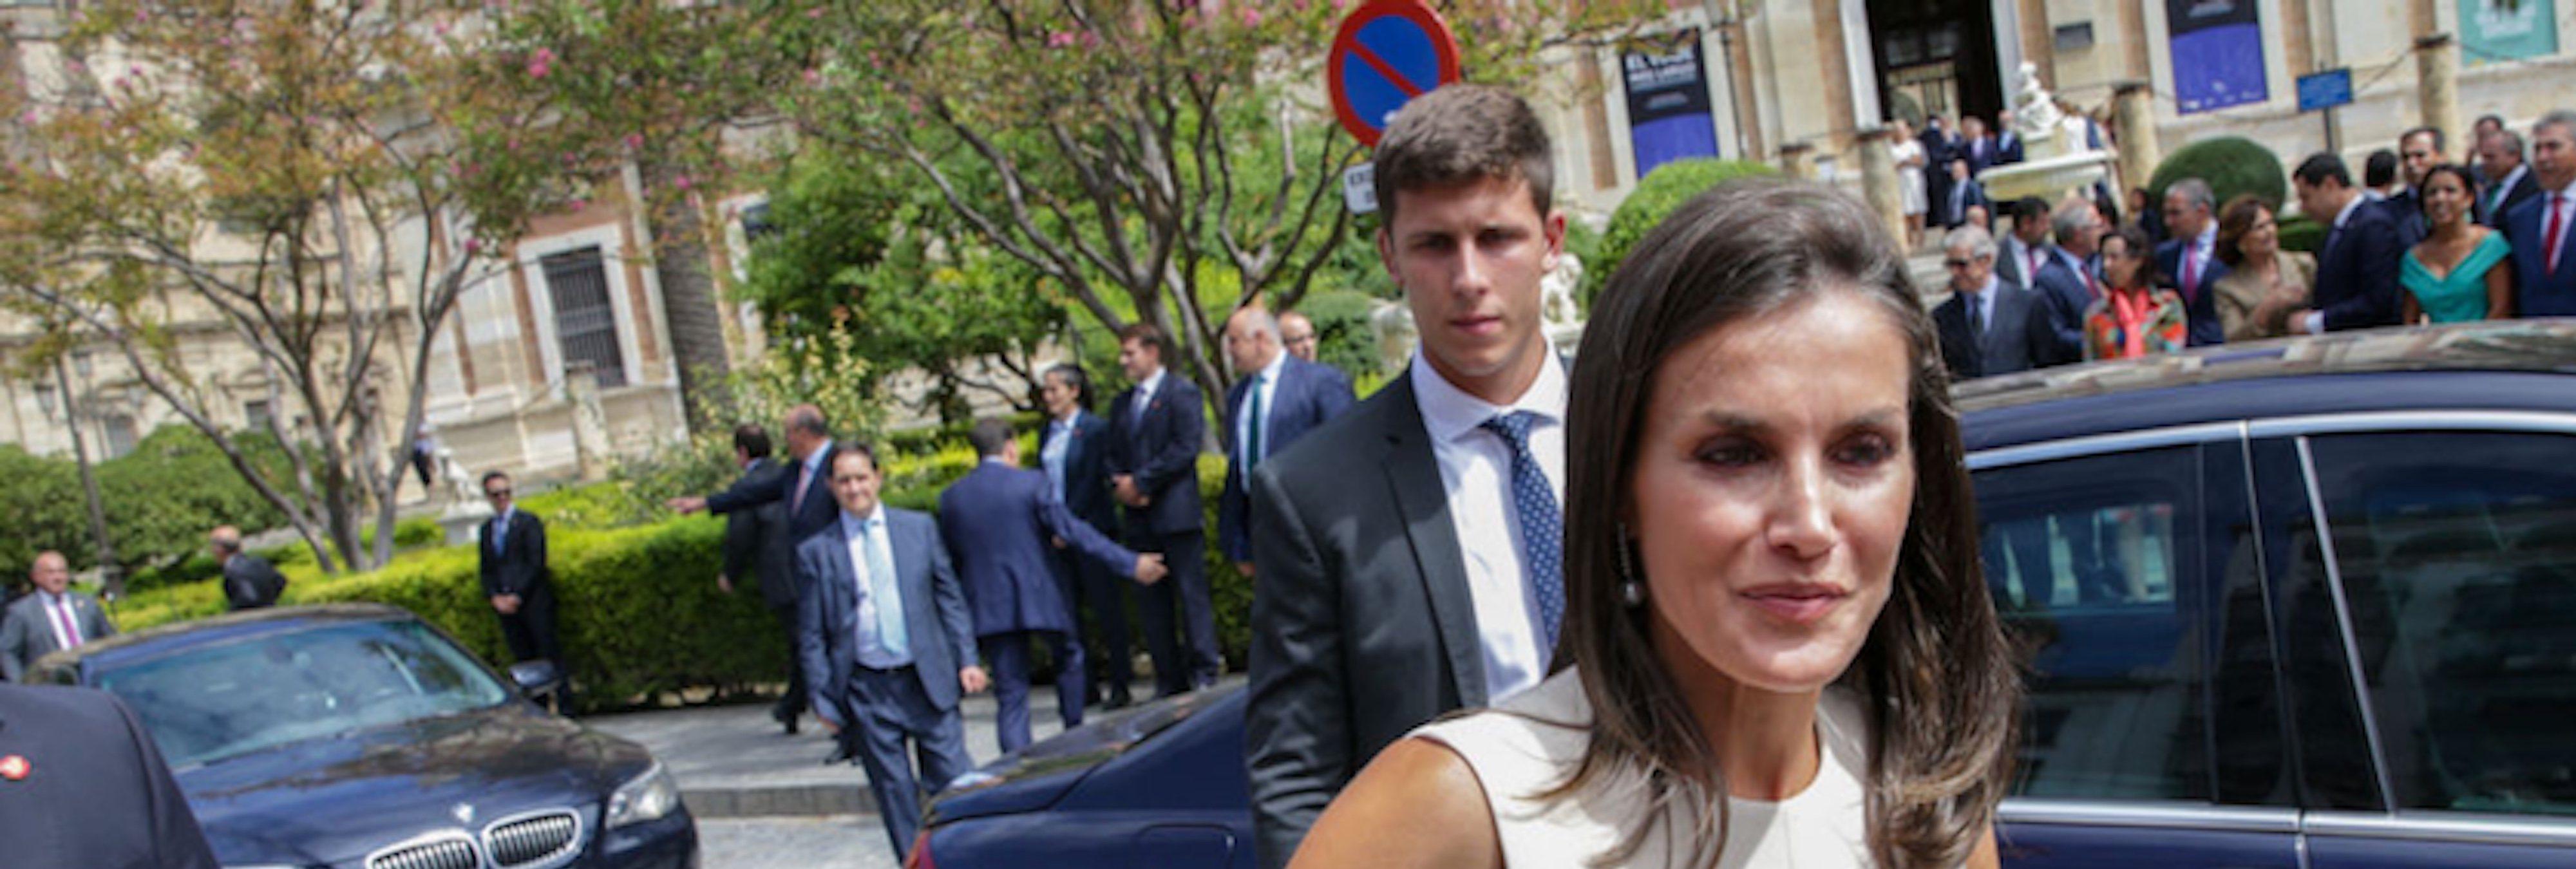 "La bronca de la reina Letizia a un escolta: ""¡Casi me mato!"""